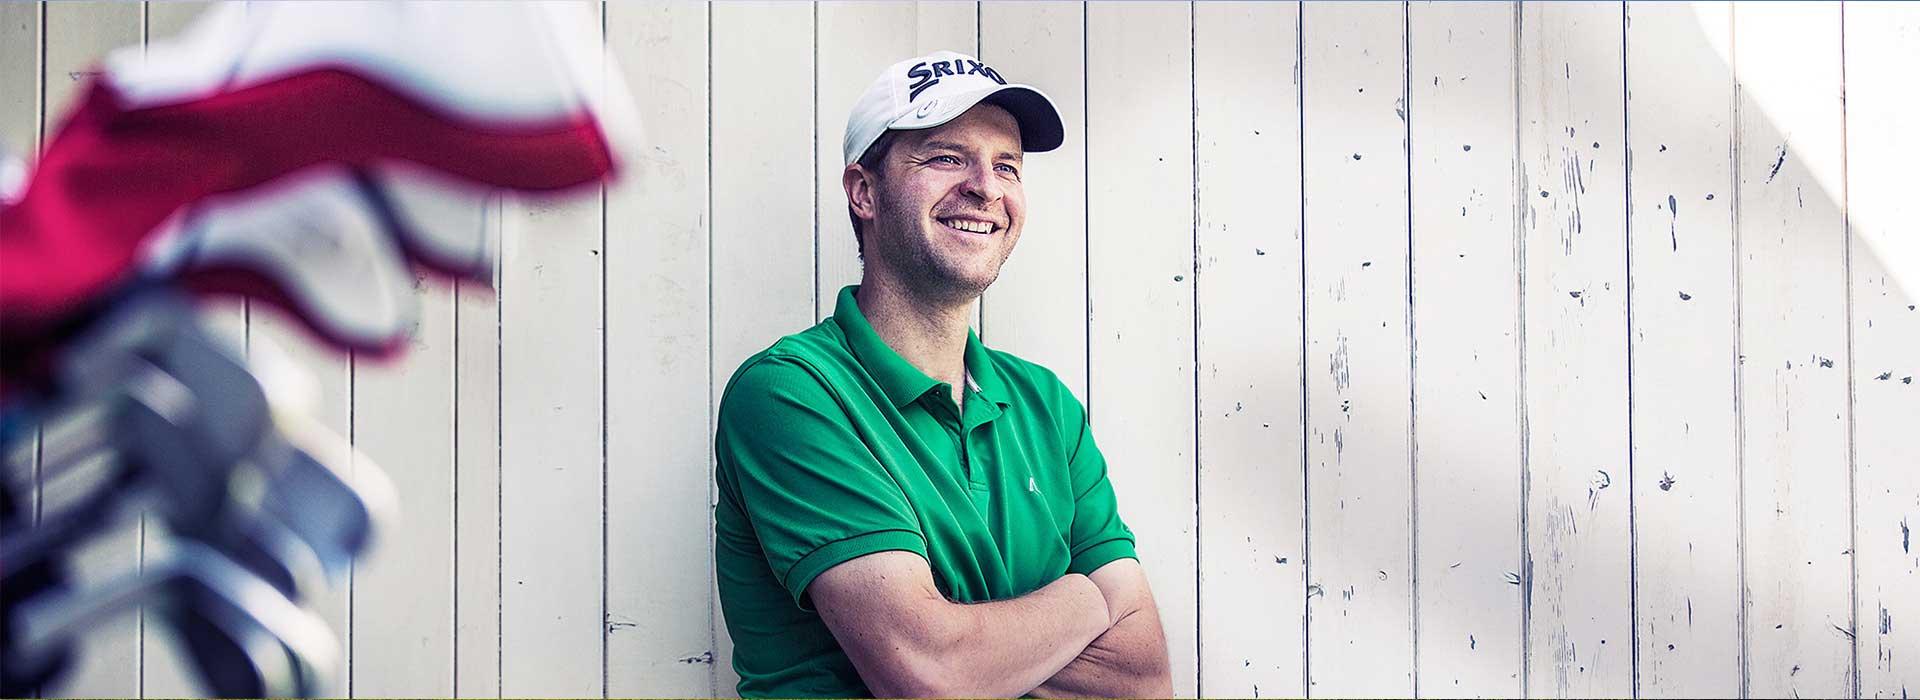 Helmut Mair Golf Bild Kontakt